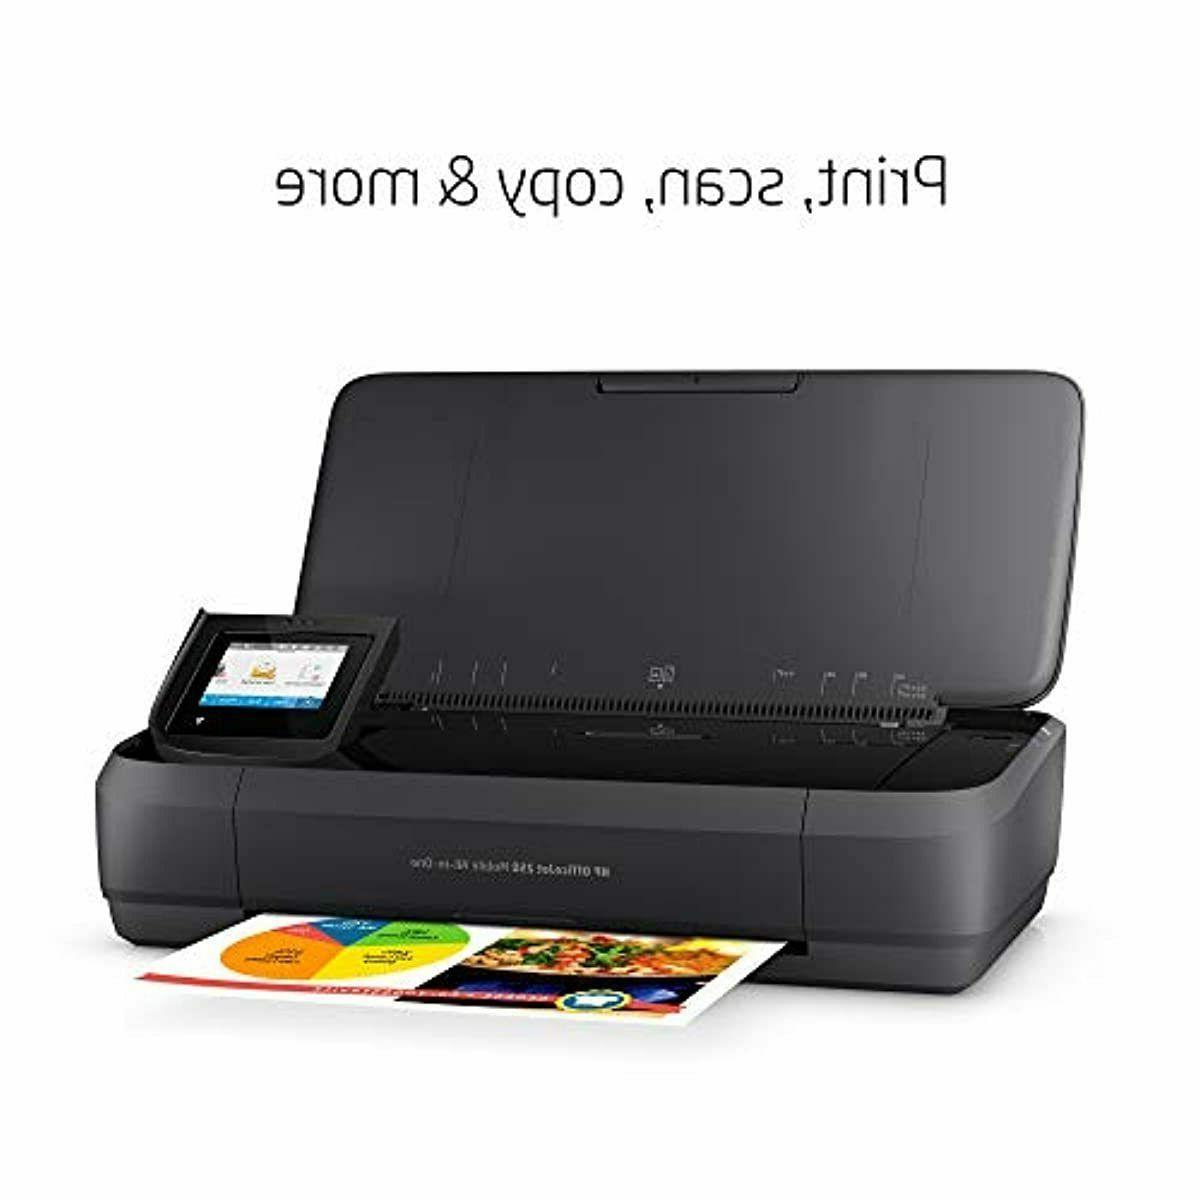 HP OfficeJet Portable &